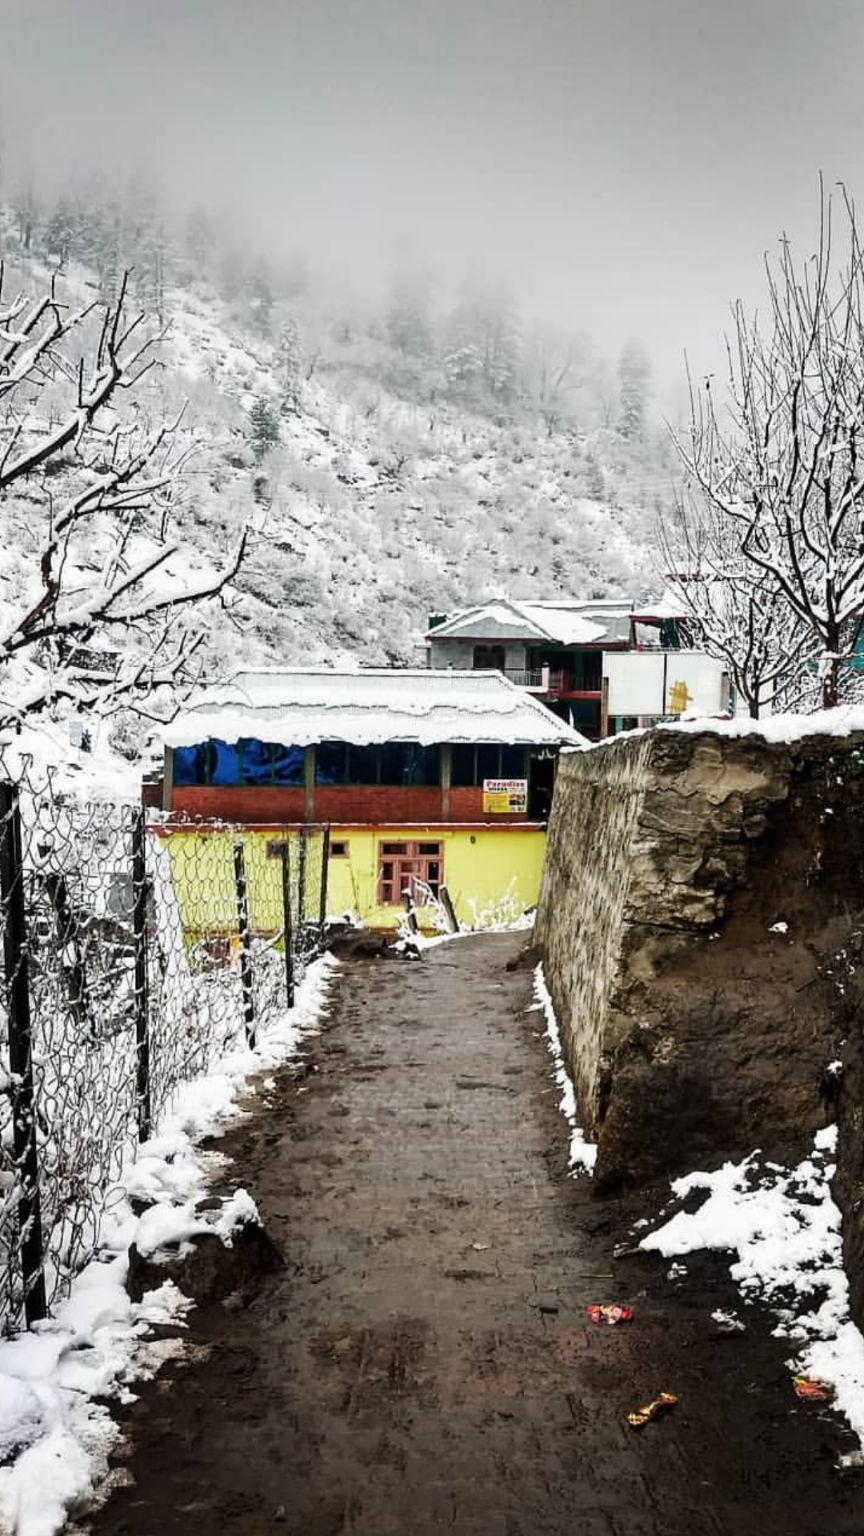 Photo of Himachal Pradesh By Ritwik Ghosal